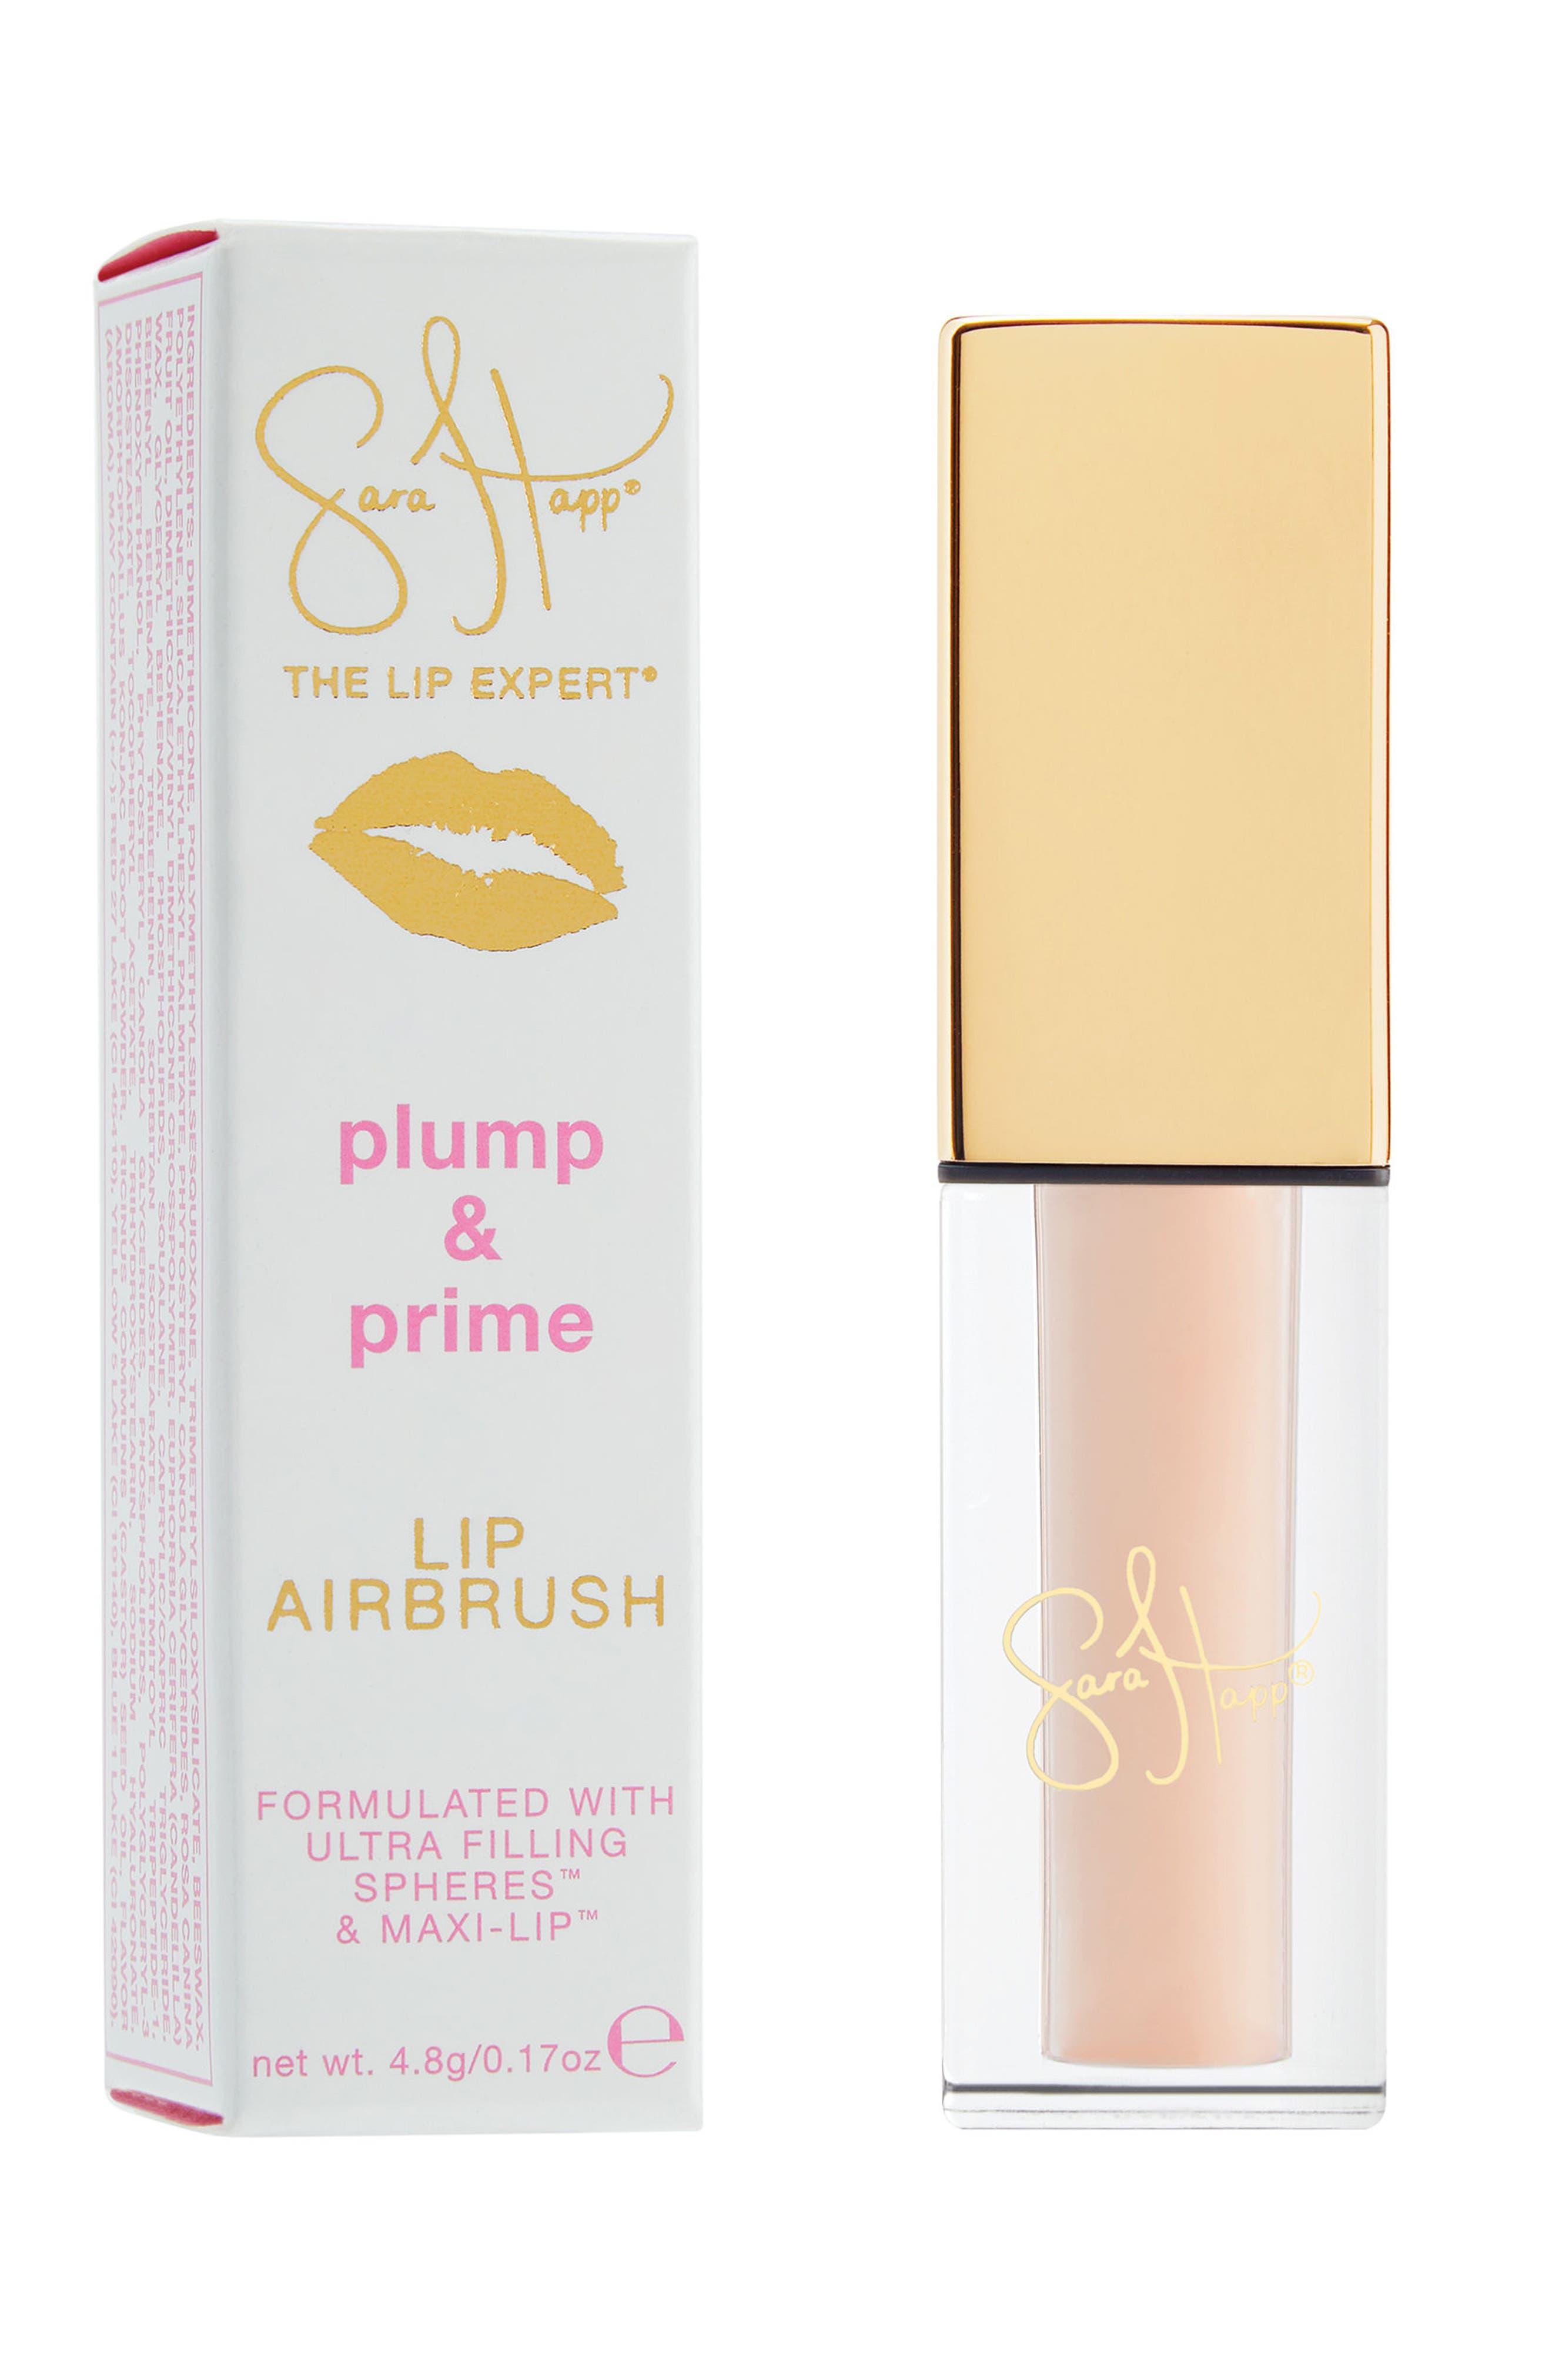 Plump & Prime Lip Airbrush,                             Main thumbnail 1, color,                             No Color